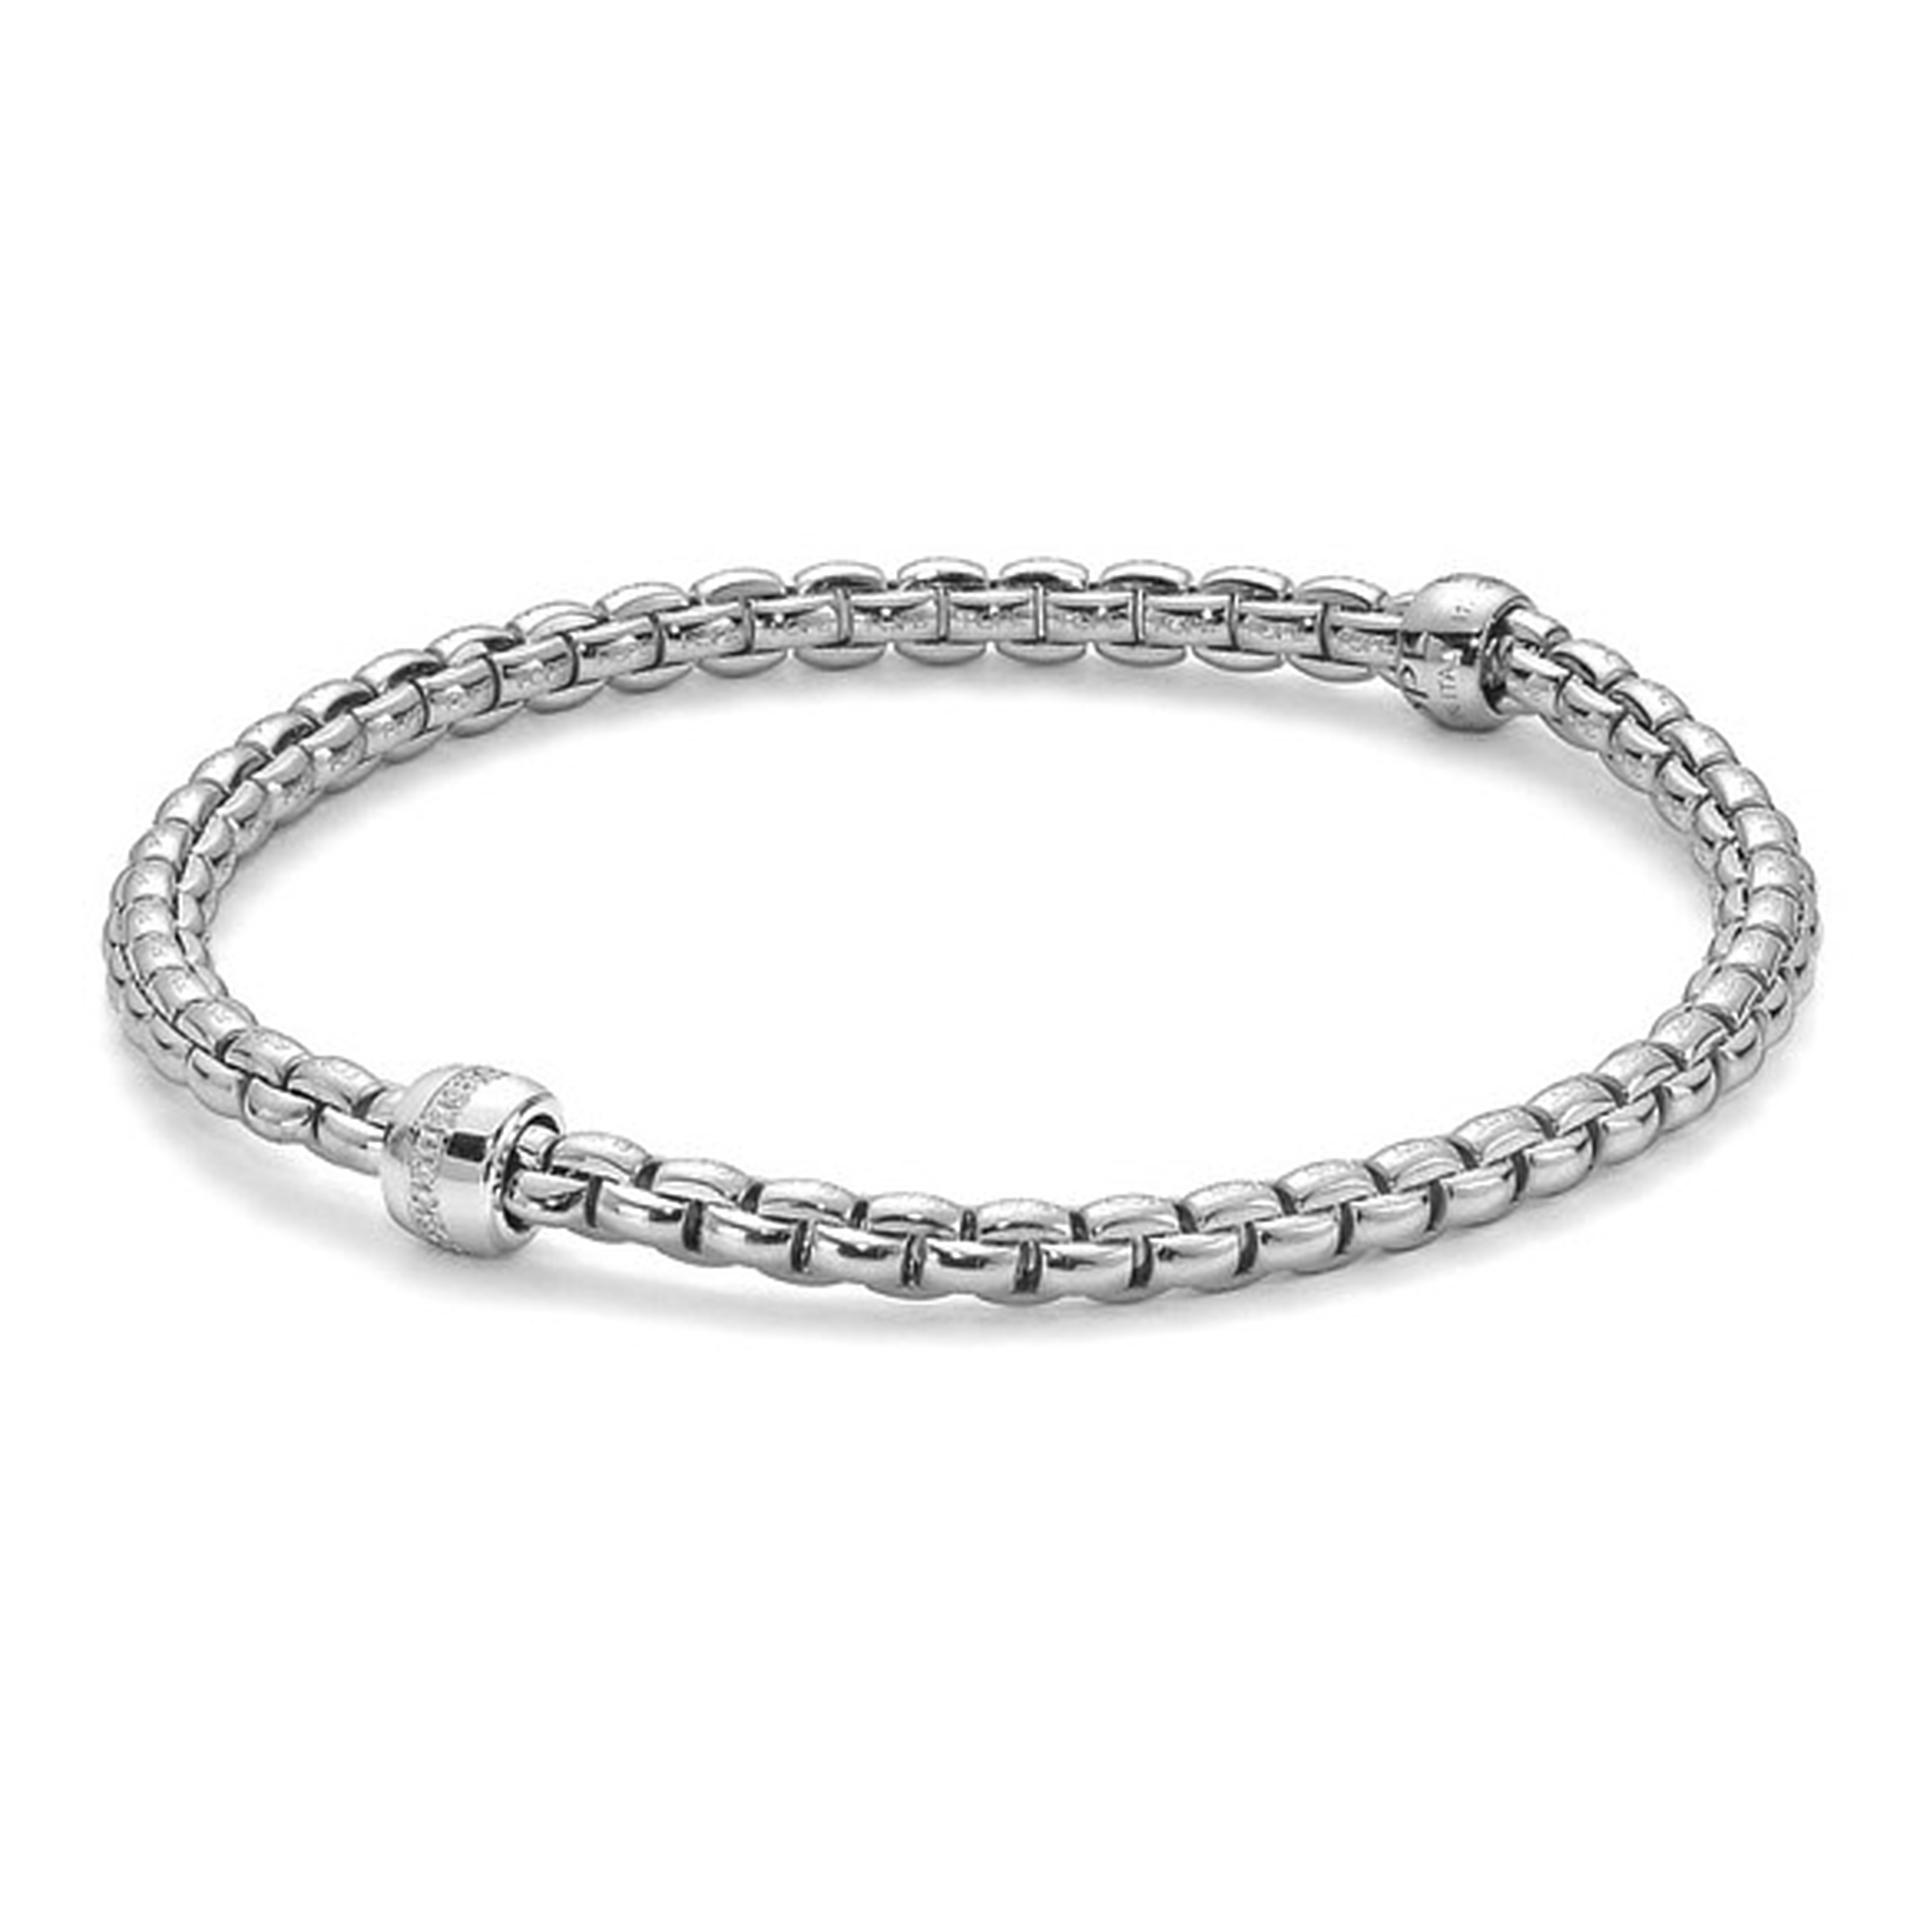 FOPE Bracelet 18ct White Gold Eka Tiny with 1 Row Diamonds